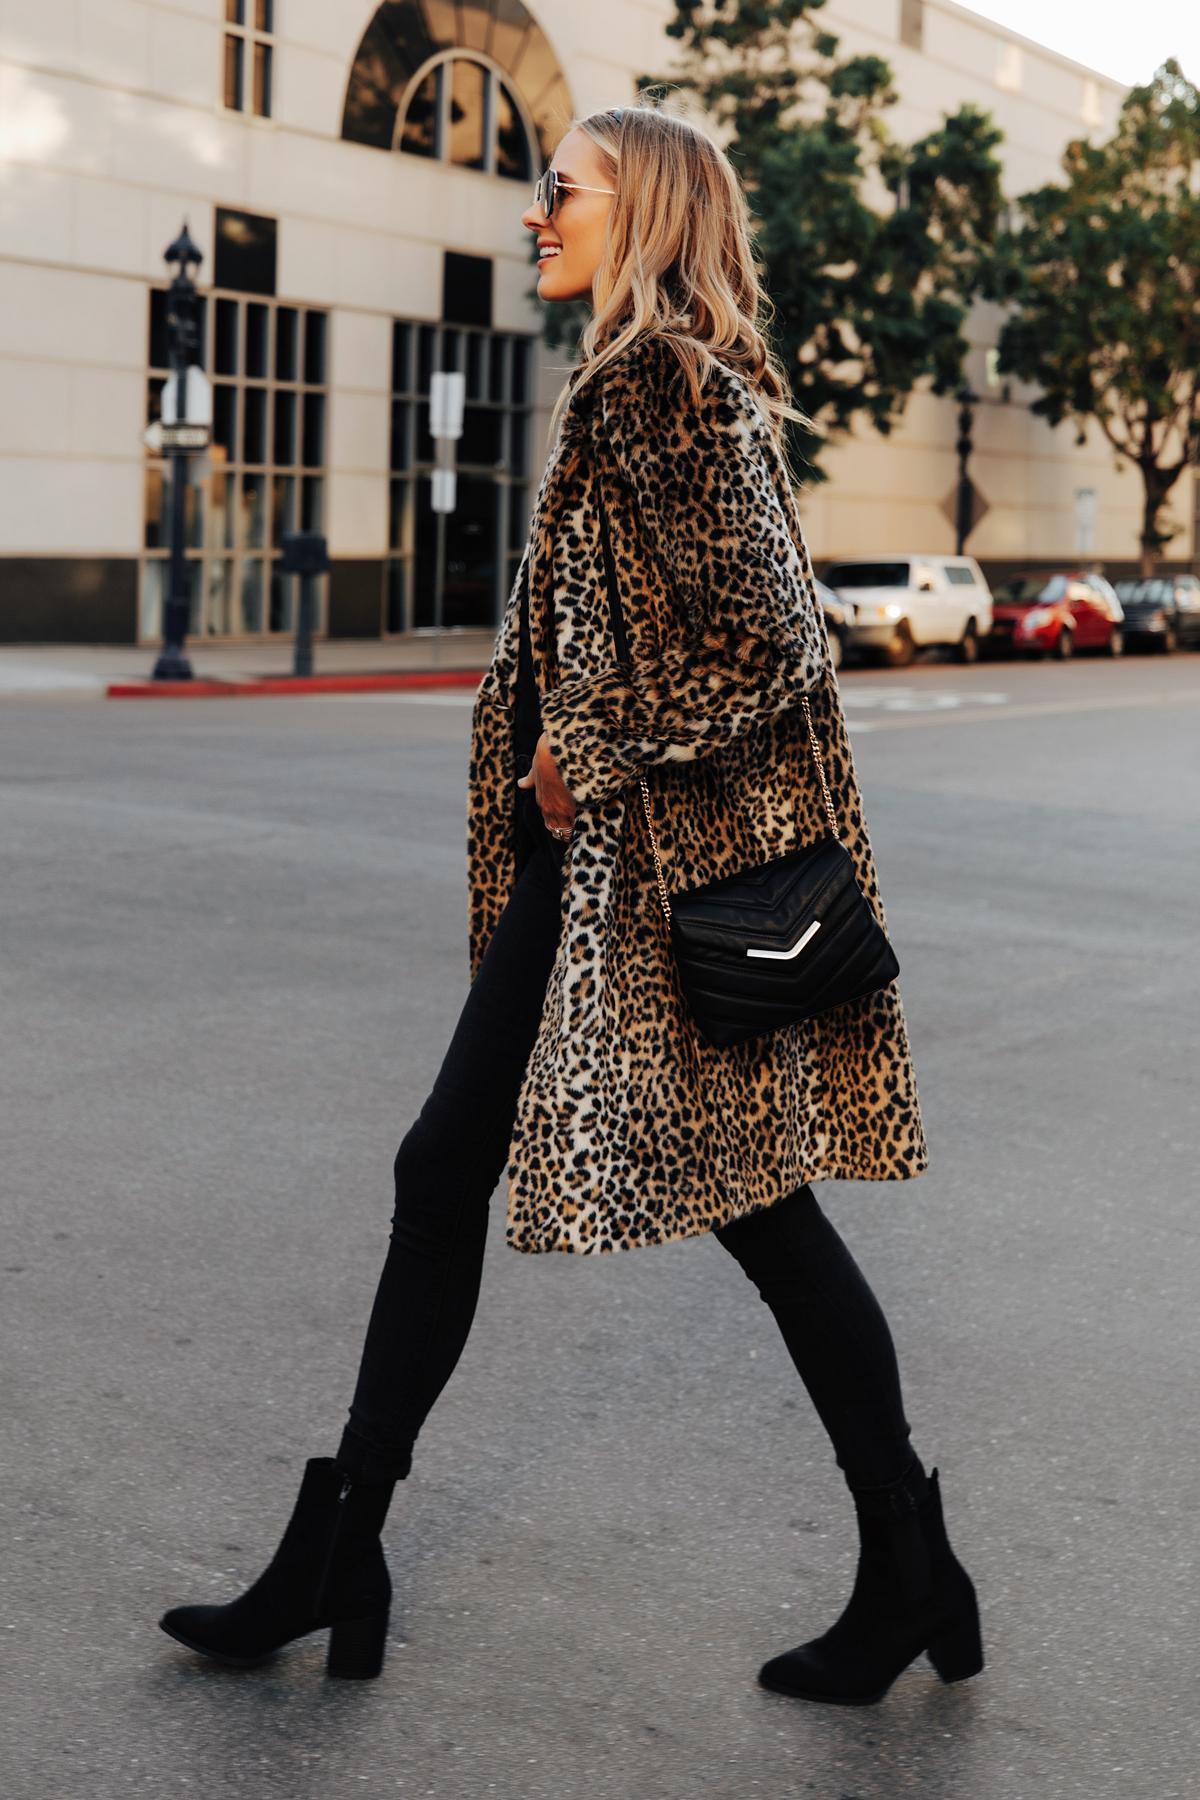 Fashion Jackson Wearing Express Faux Fur Leopard Coat Black Jeans Black Booties Christmas Outfit Idea